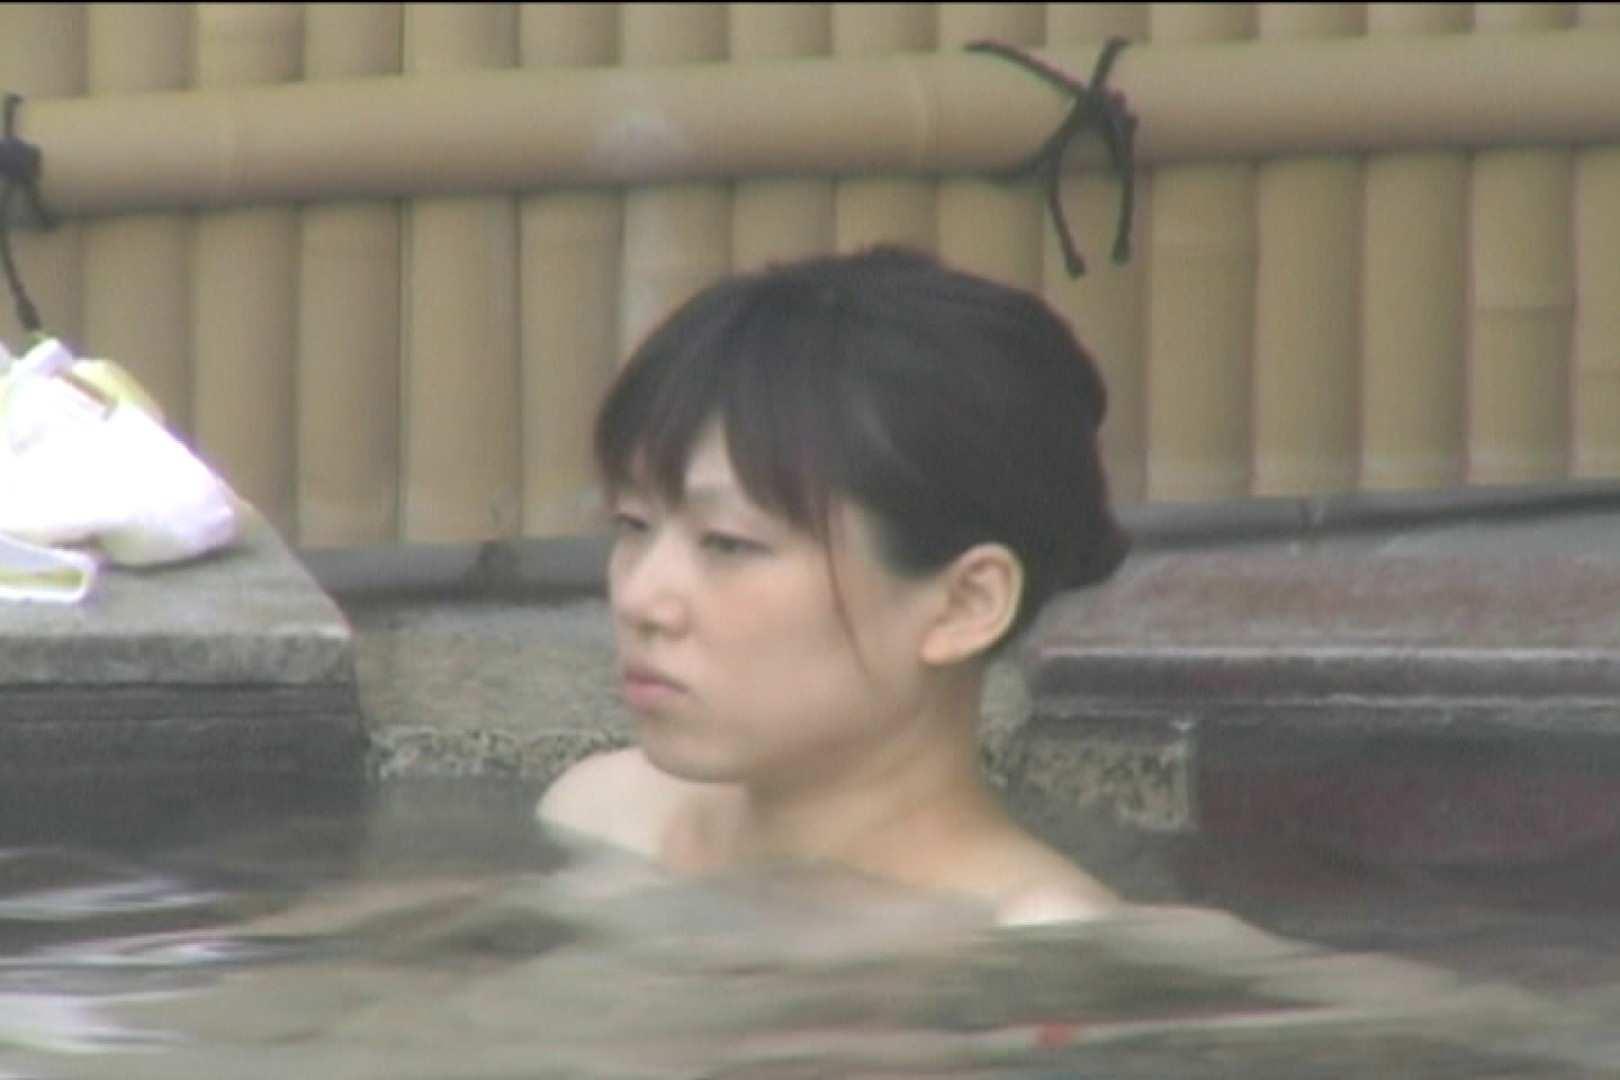 Aquaな露天風呂Vol.121 露天  89連発 42